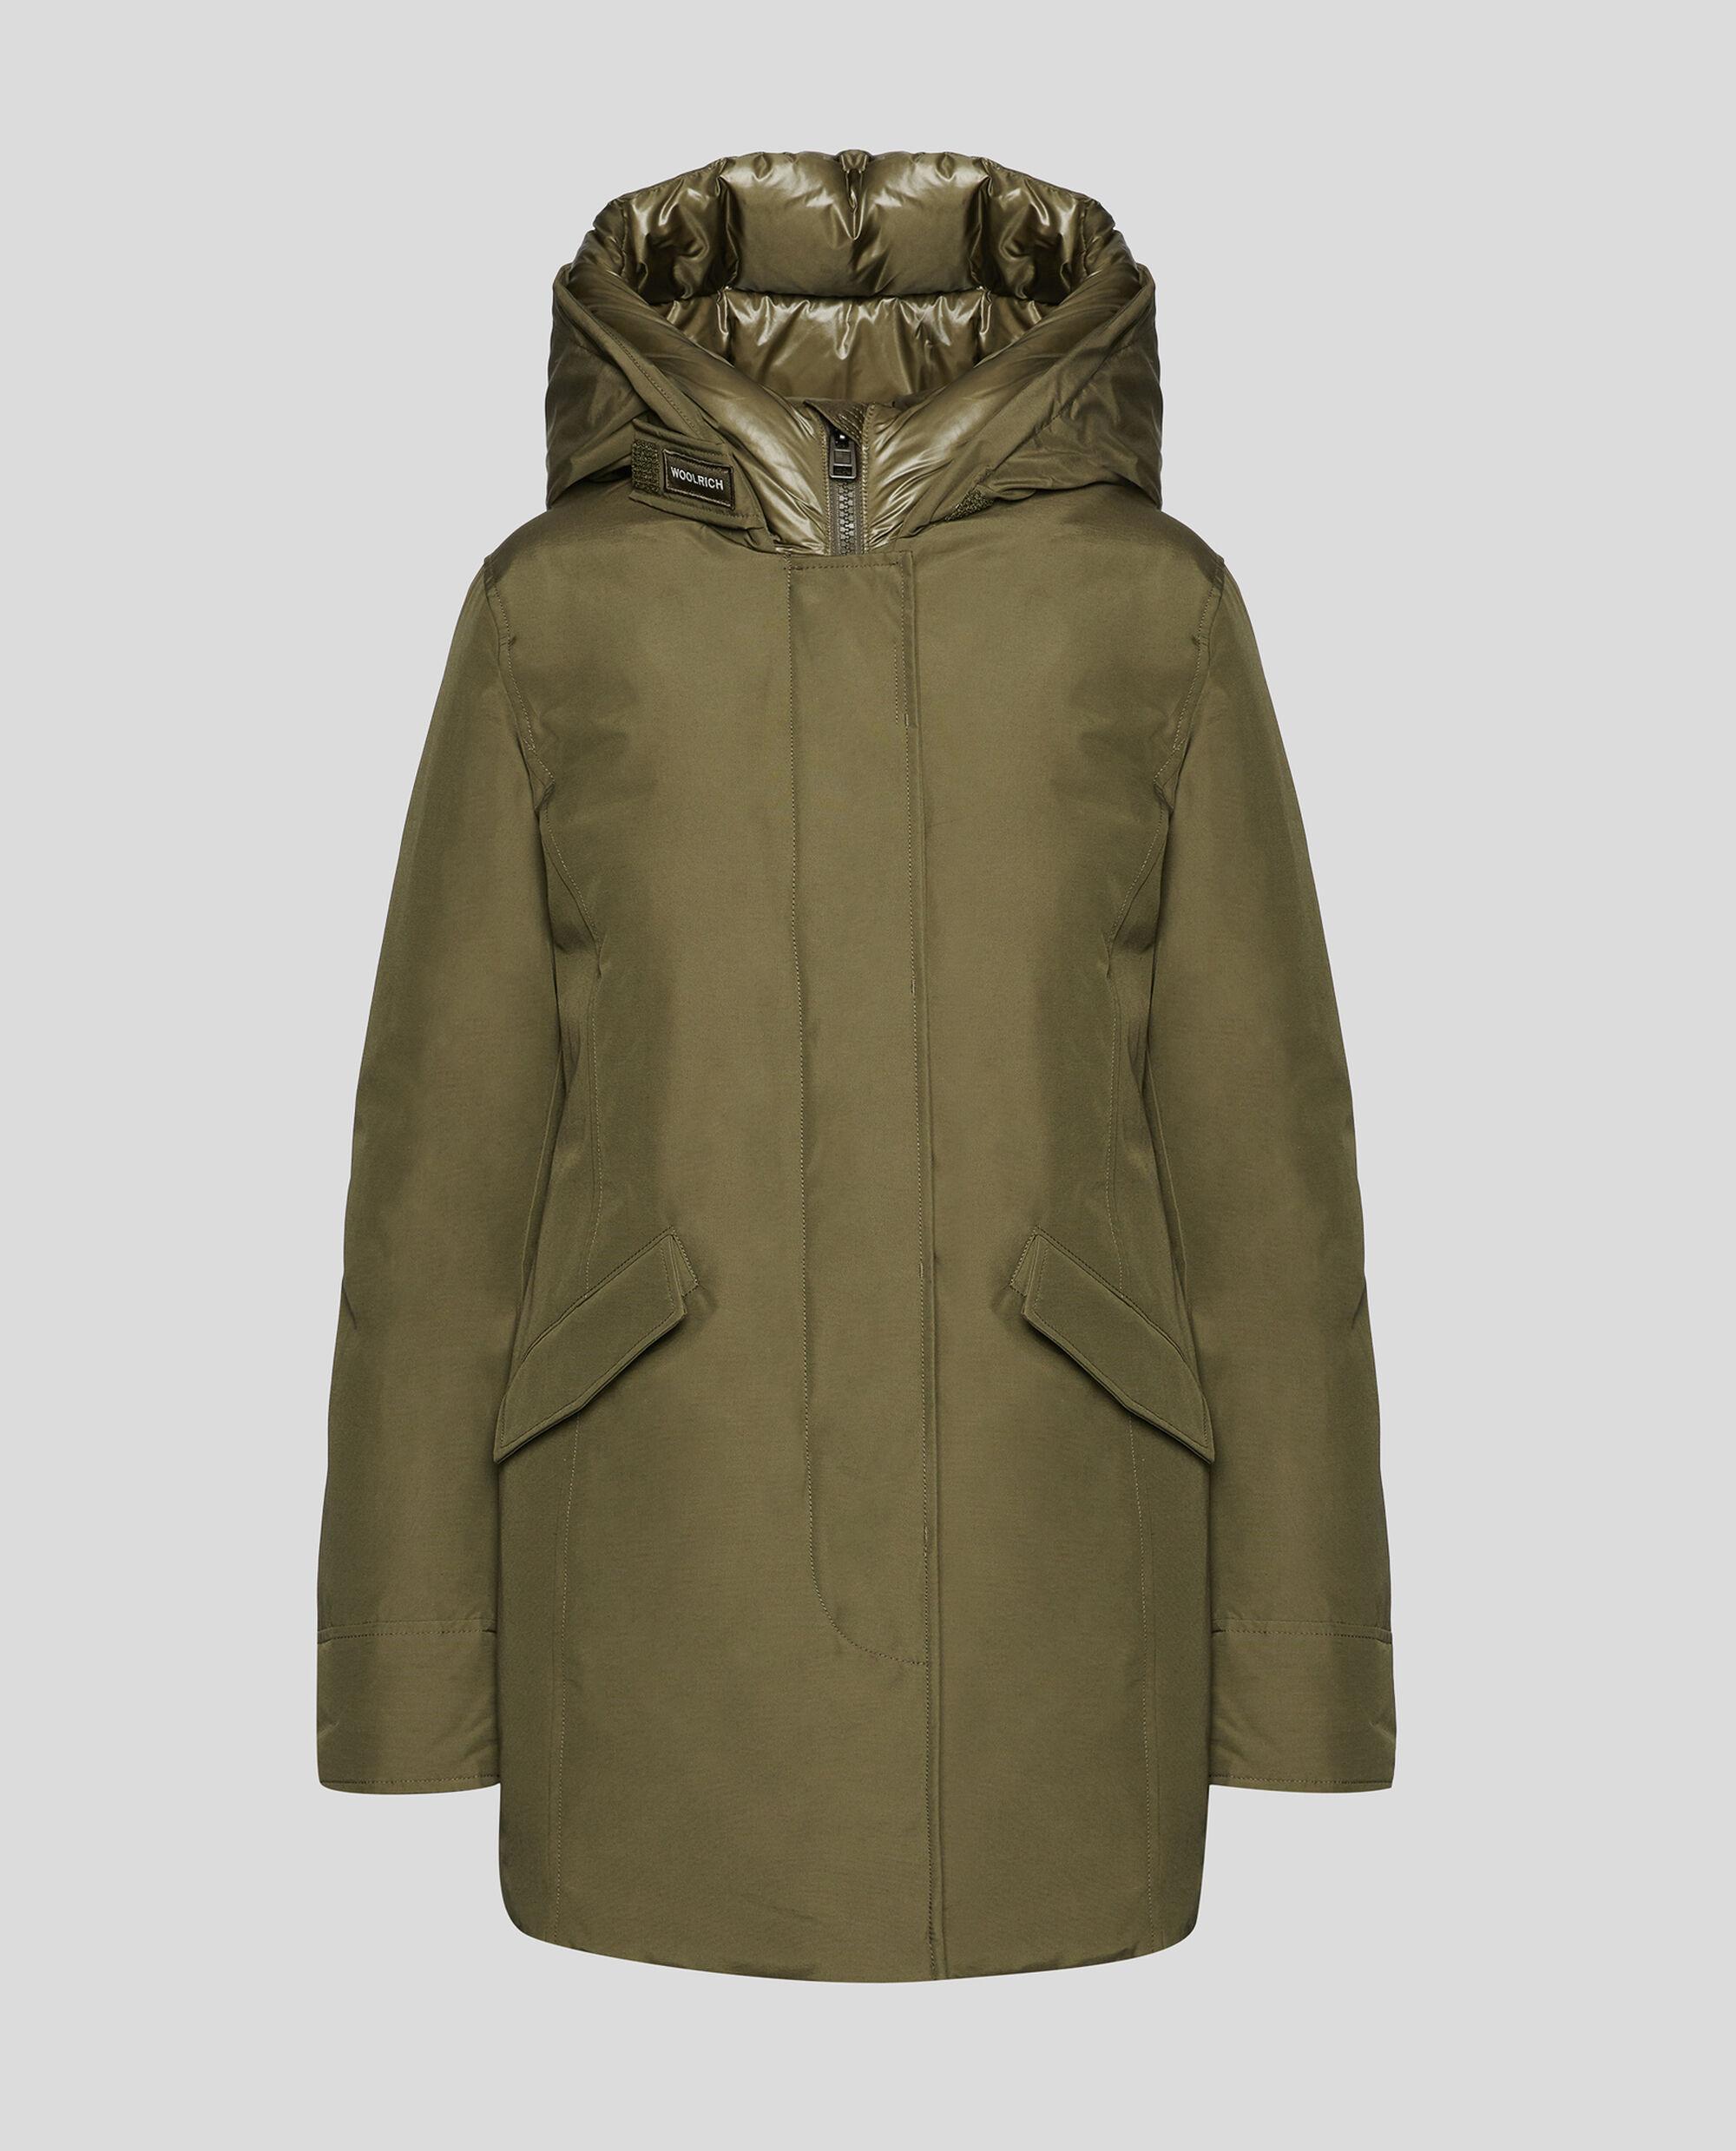 Woolrich WS Artic NF Verde Militare